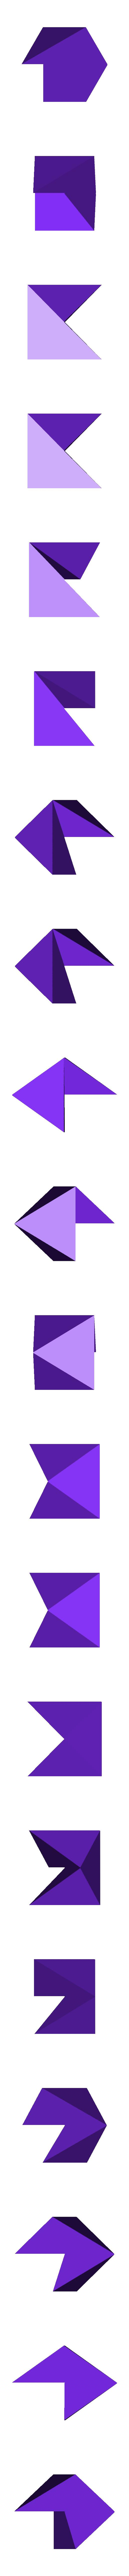 Octahedron_half_Z_edge_42.stl Télécharger fichier STL gratuit Octaèdre en cube / Hexaèdre • Plan imprimable en 3D, LGBU